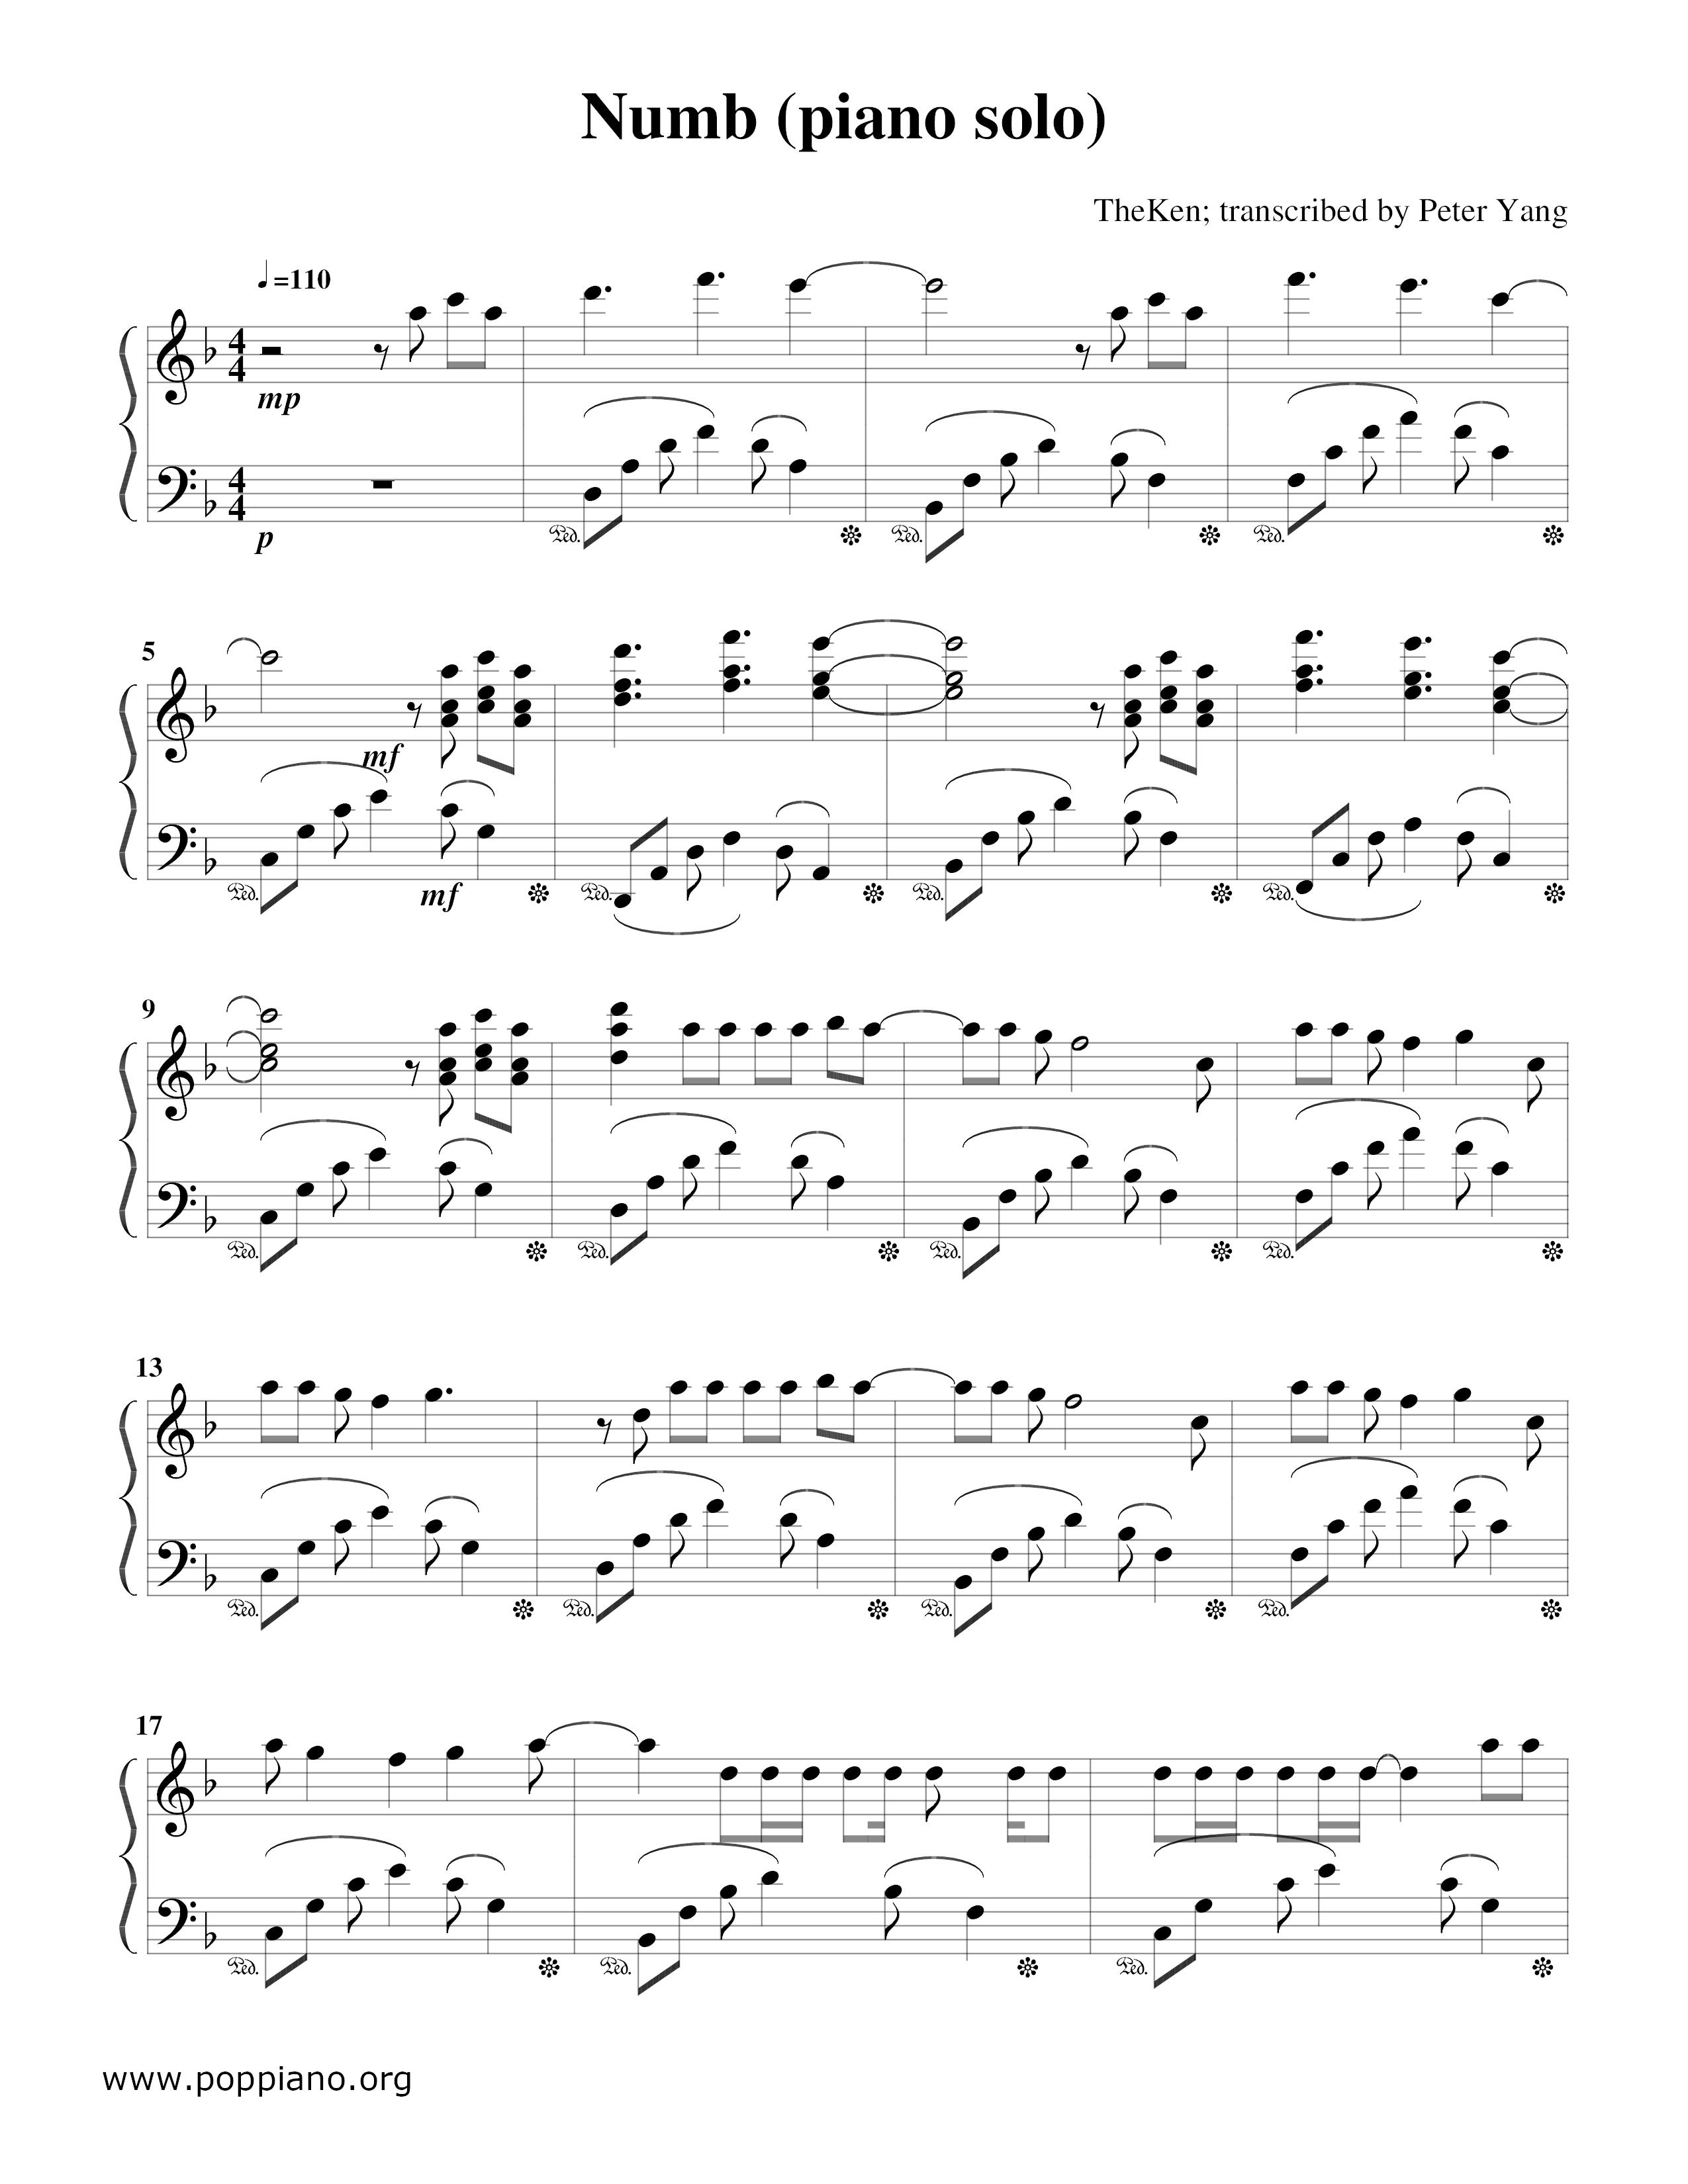 ☆ Linkin Park - Numb琴譜/五線譜pdf - 香港流行鋼琴協會琴譜下載☆